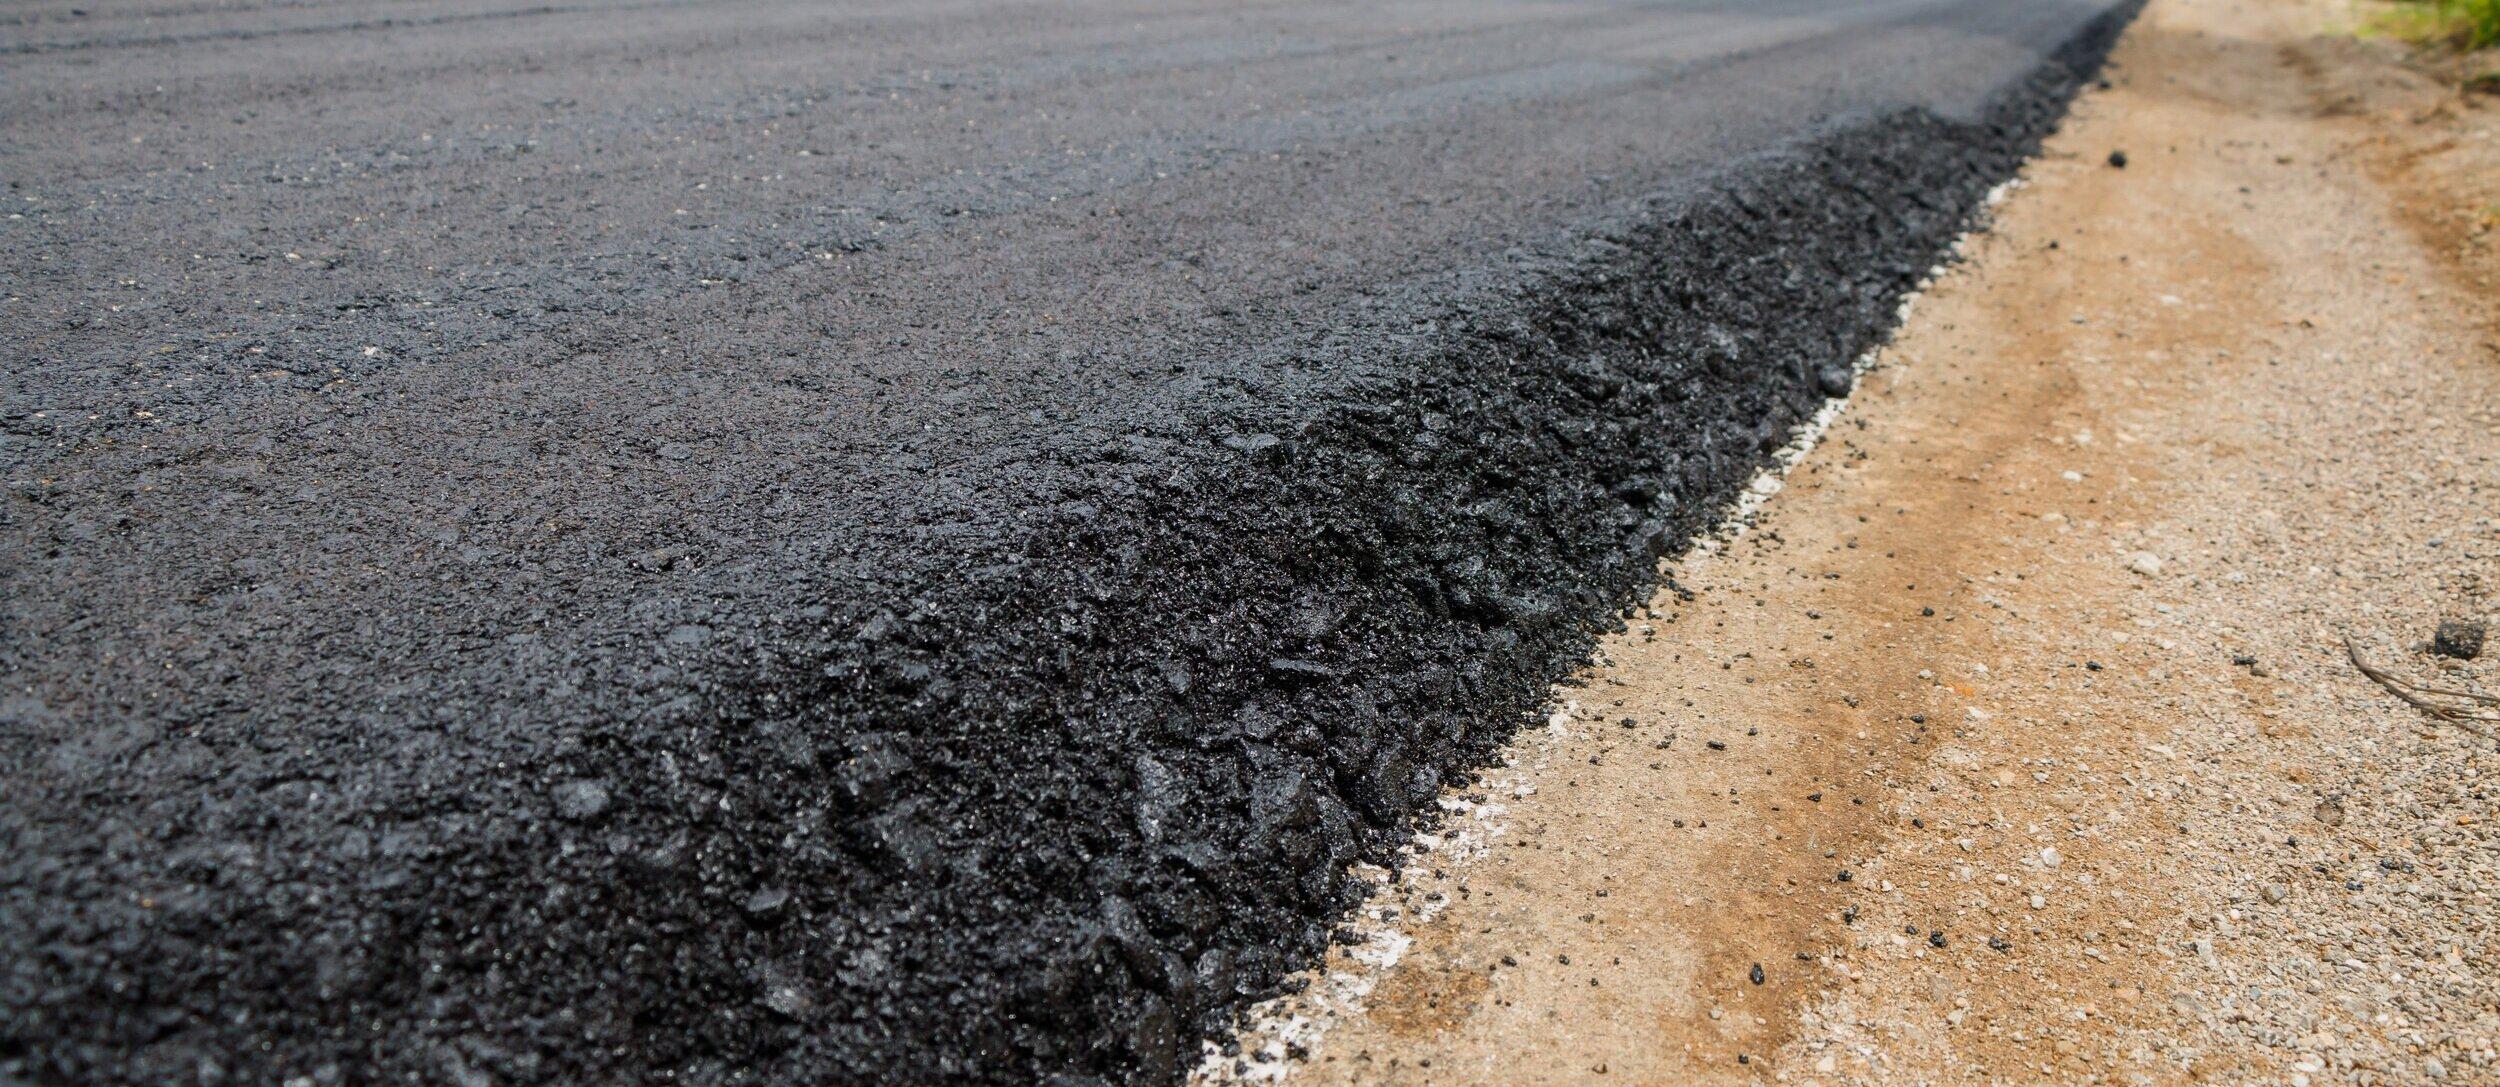 Resurfacing-Roads-Bergen-County-NJ-Riggi-Paving.jpg